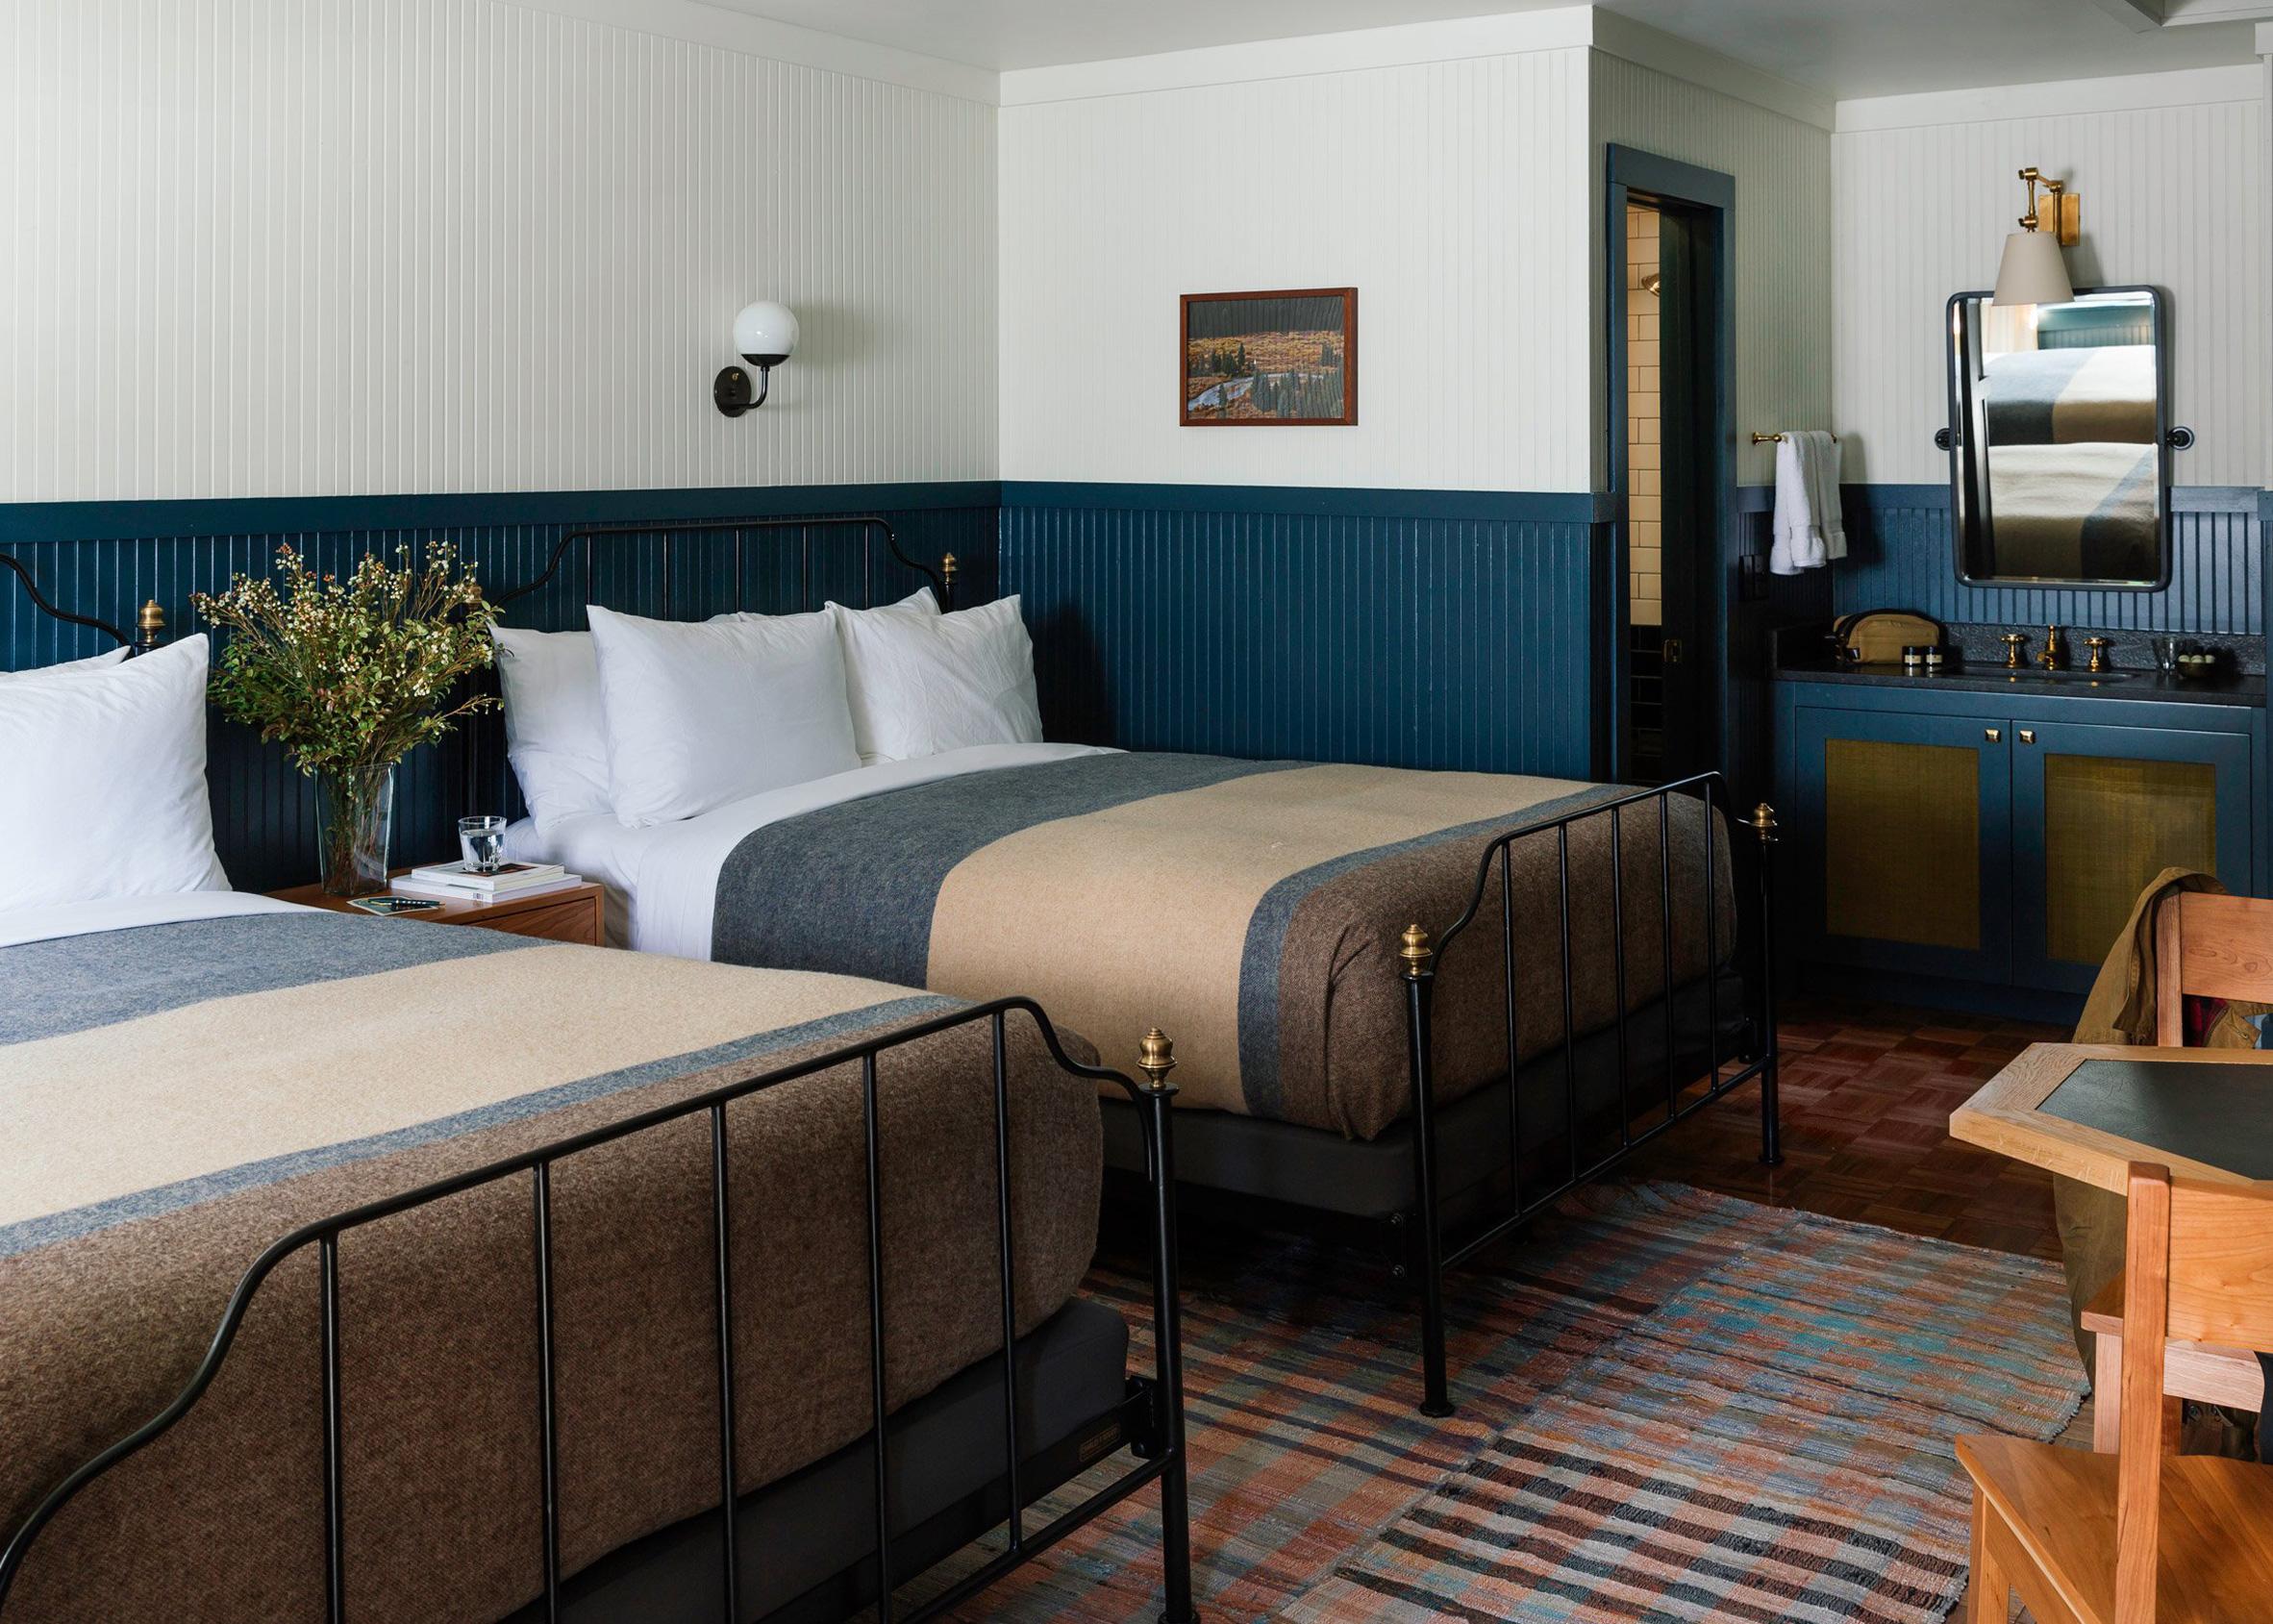 Anvil Hotel, USA, by Studio Tack